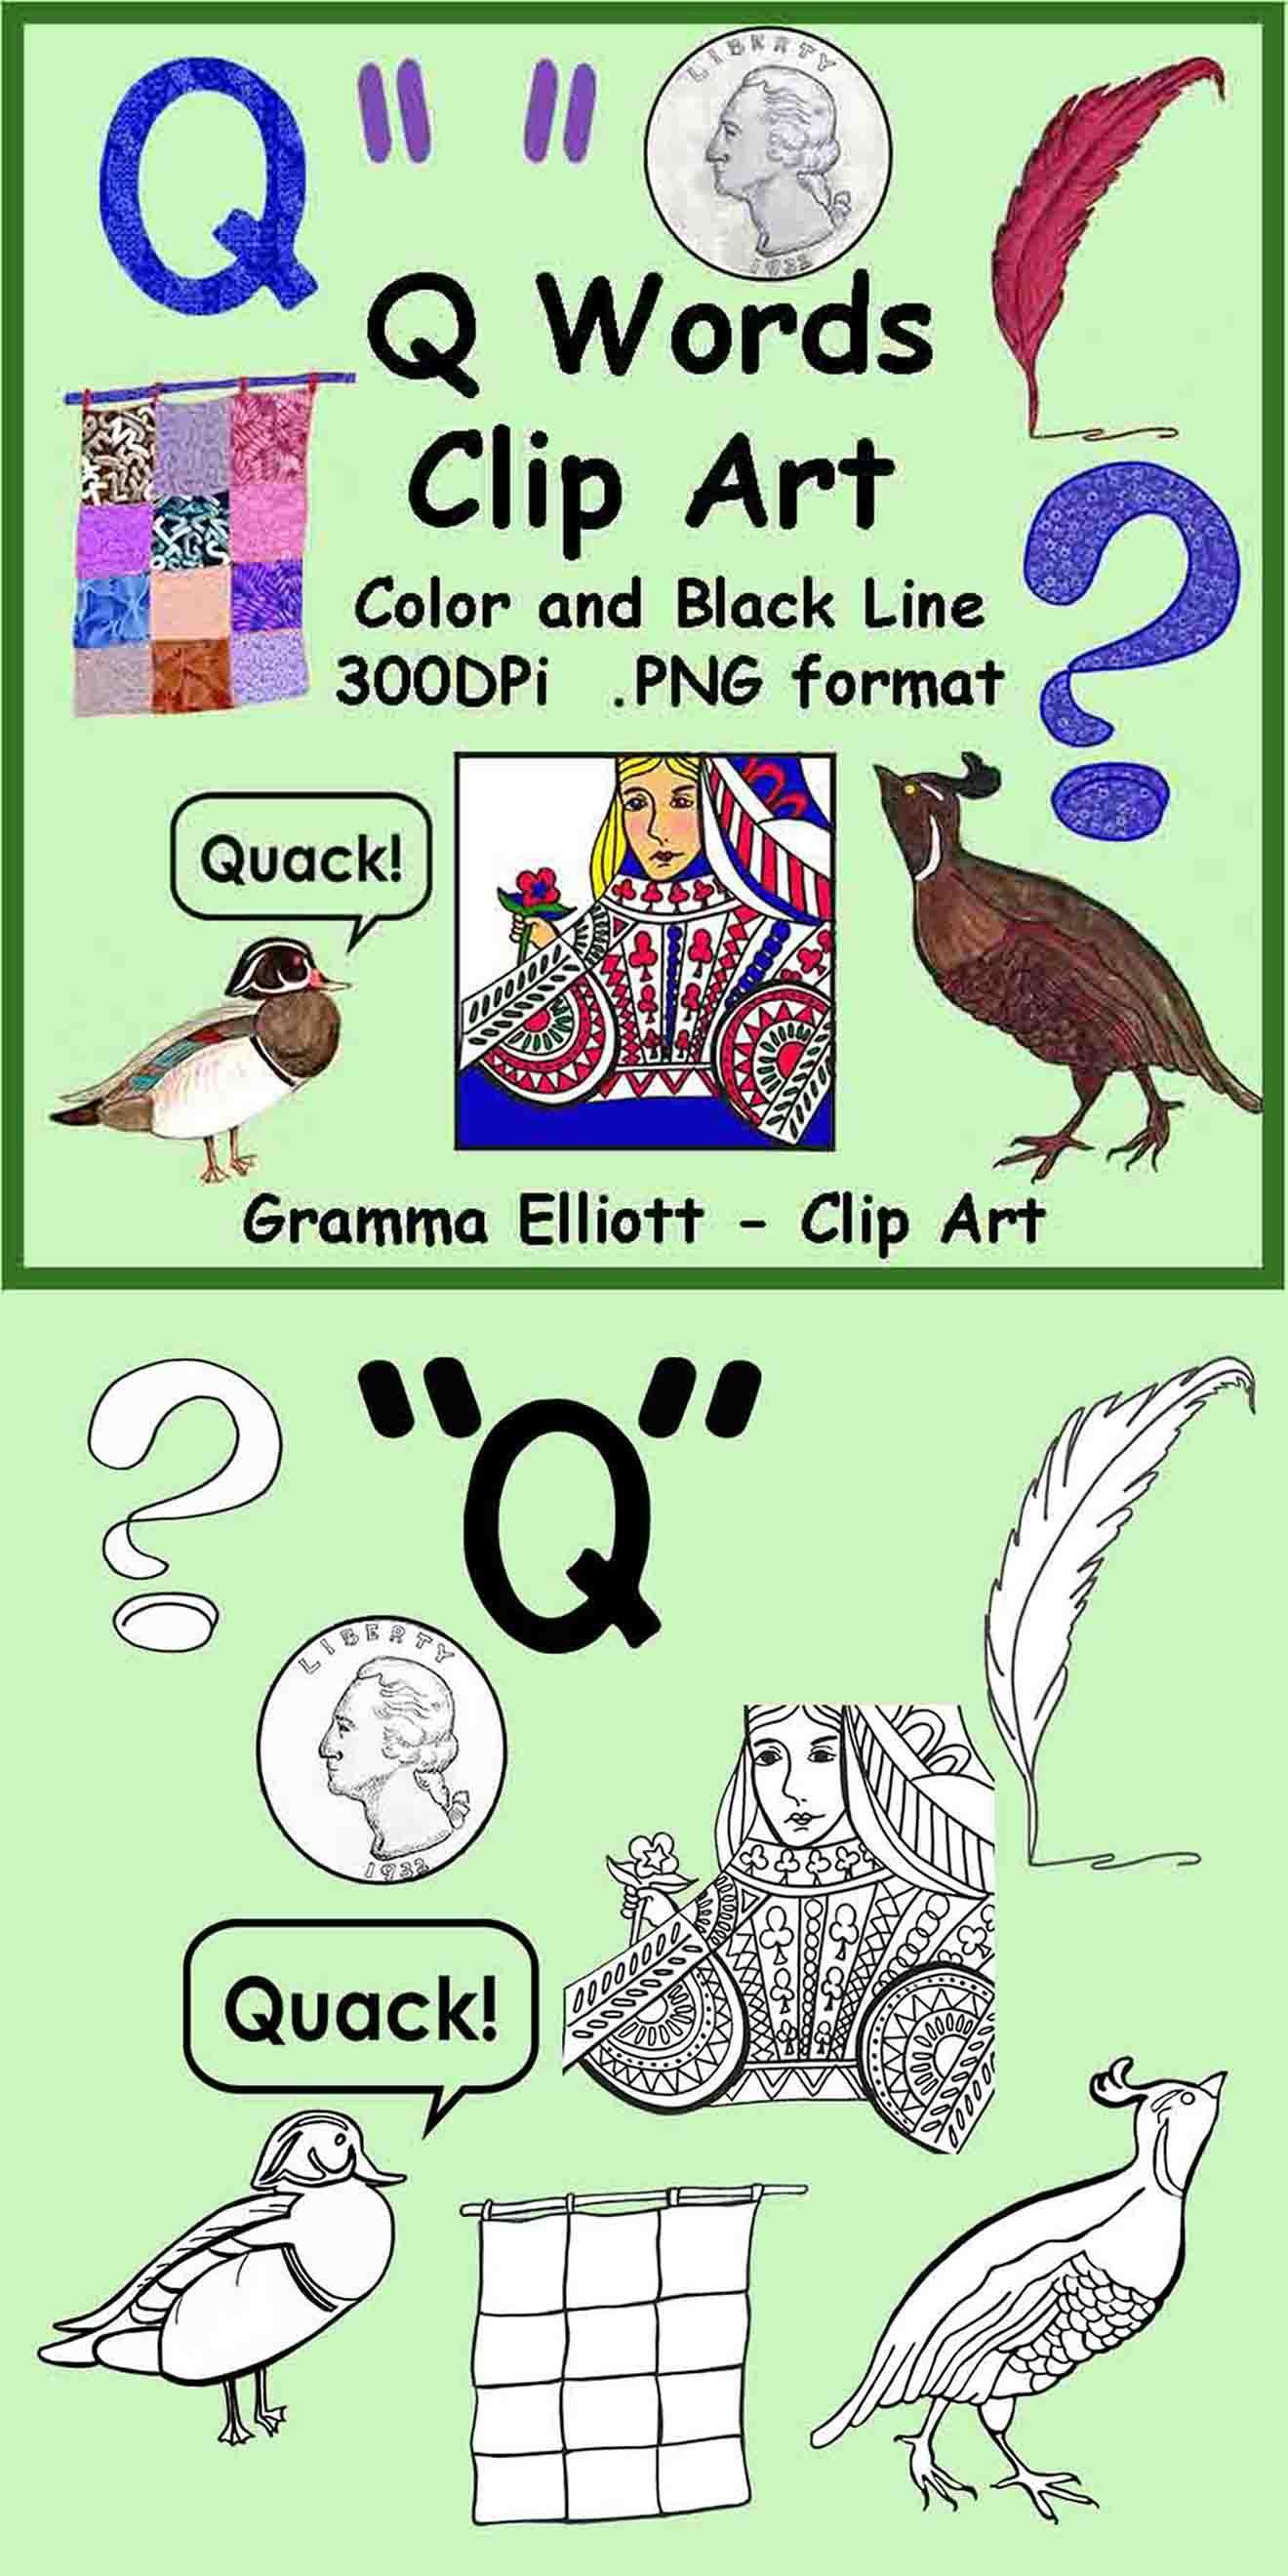 Q Words Realistic Clip Art Color and Black Line Clip art